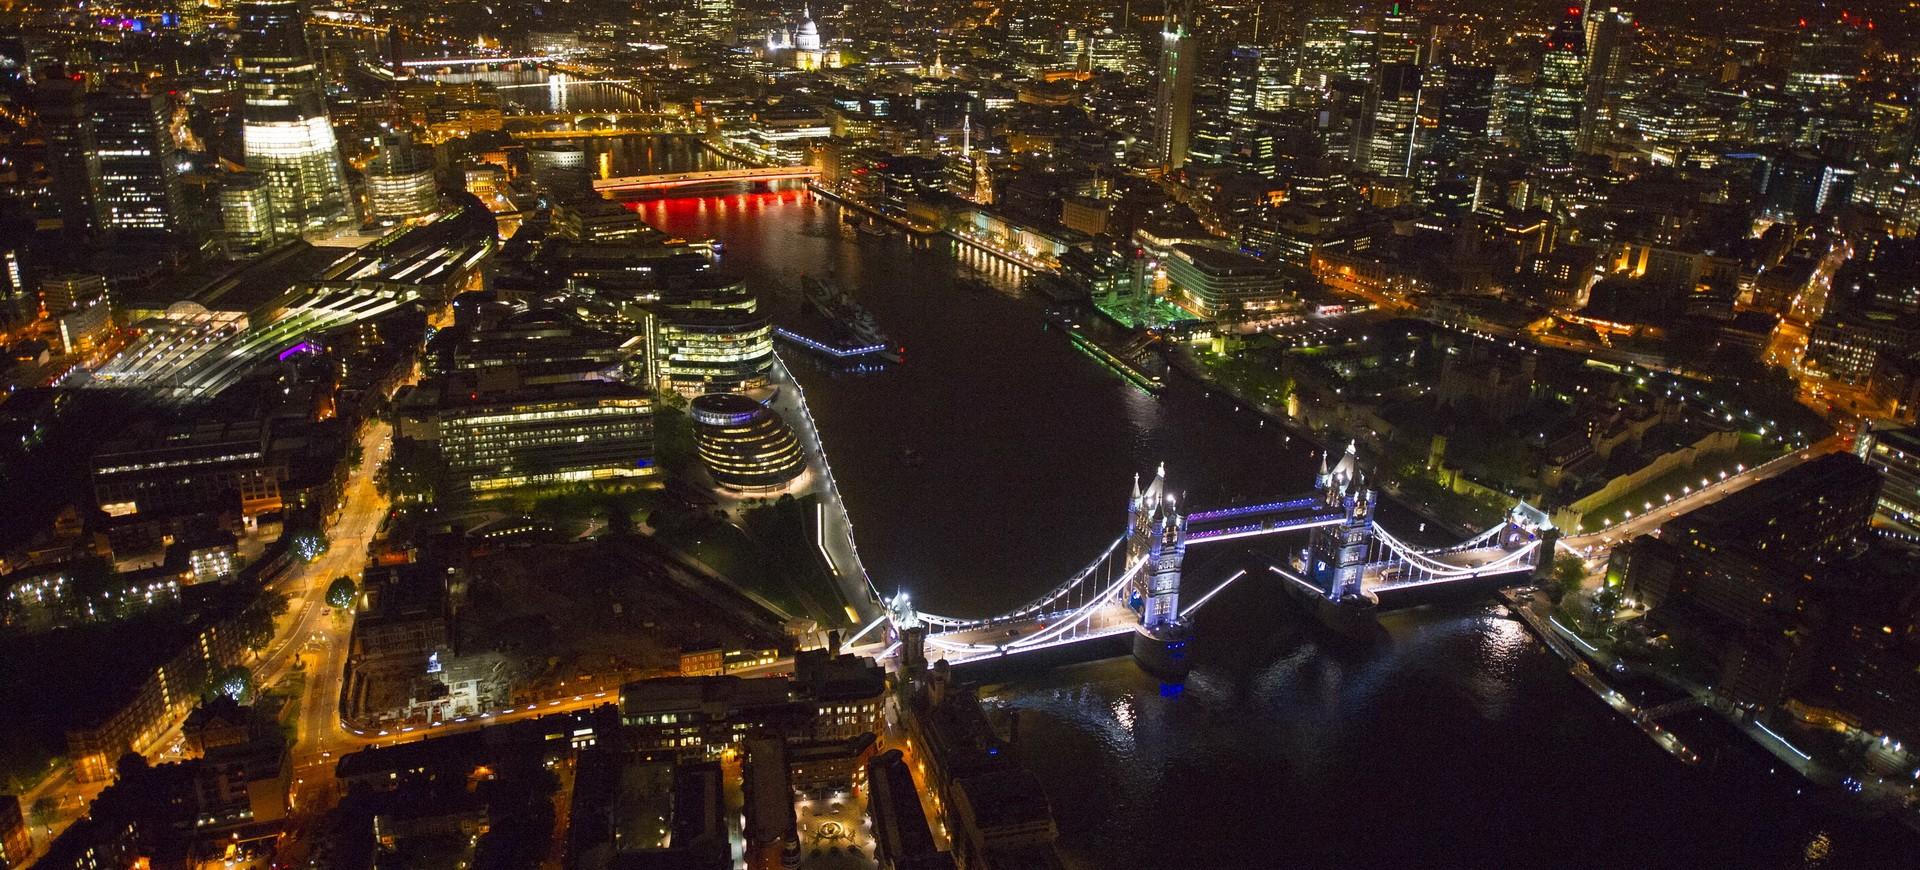 Royaume Uni Londres Tower Bridge by night